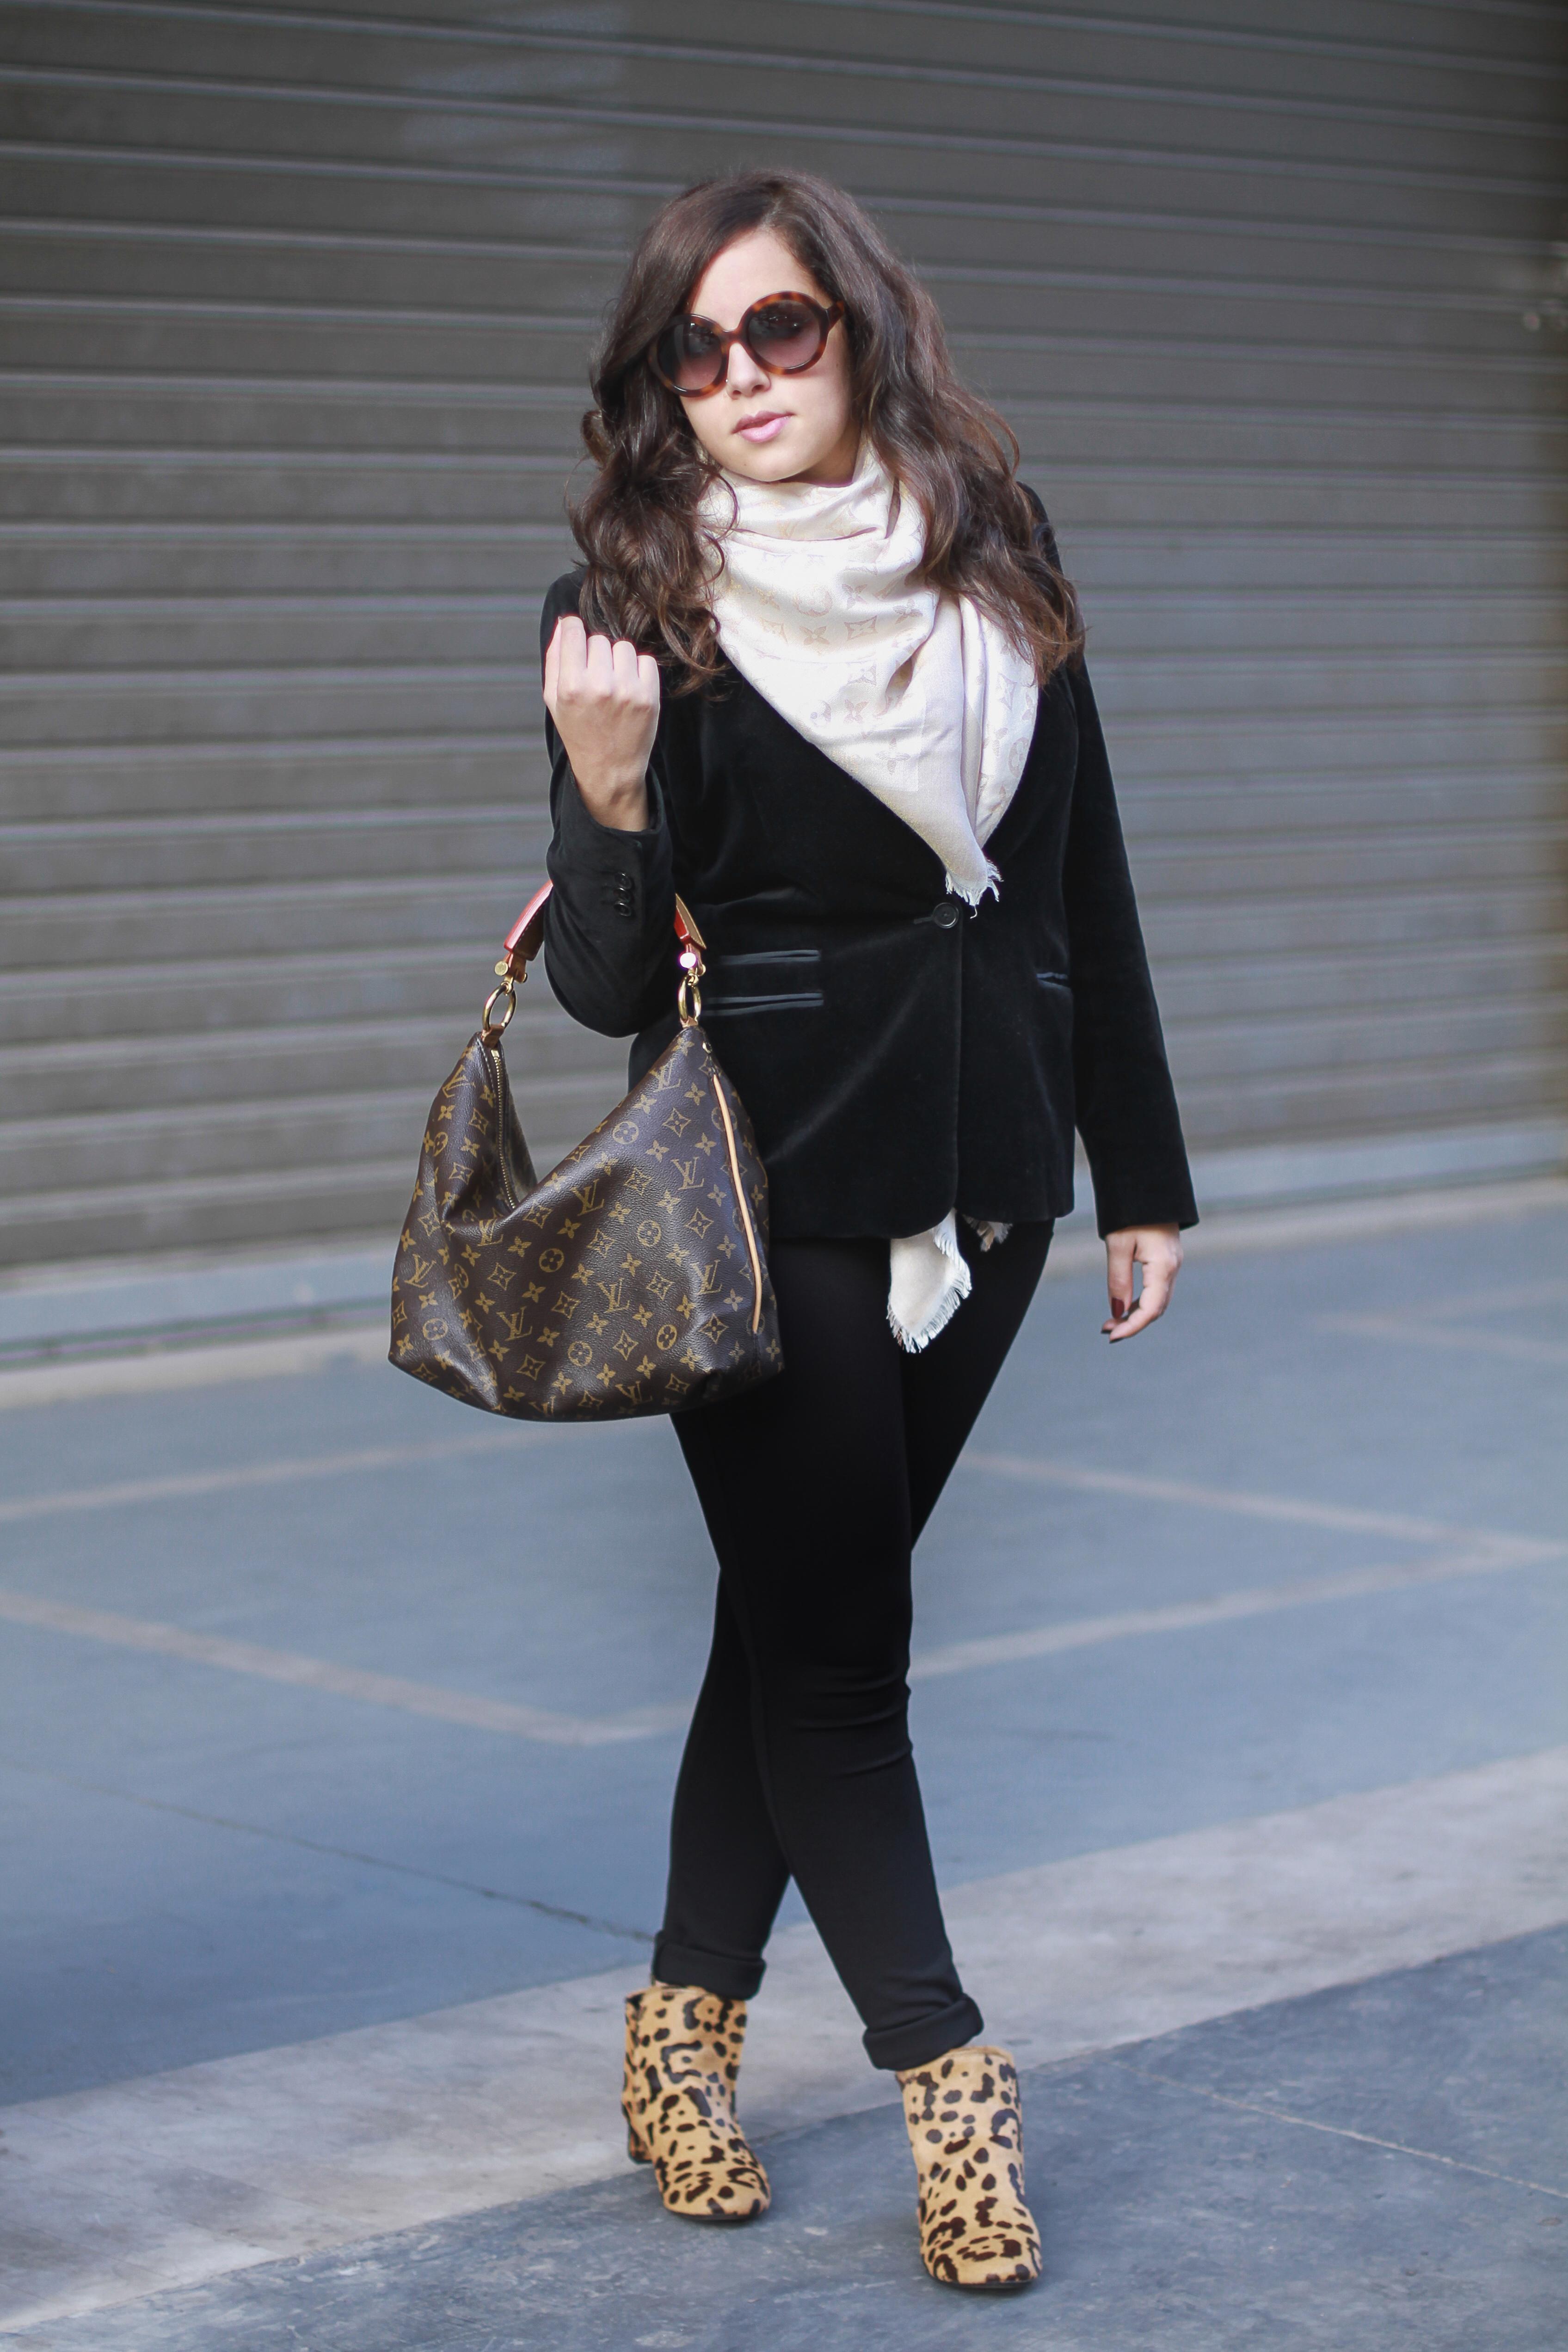 le-total-look-noir-blog-mode-chiccarpediem